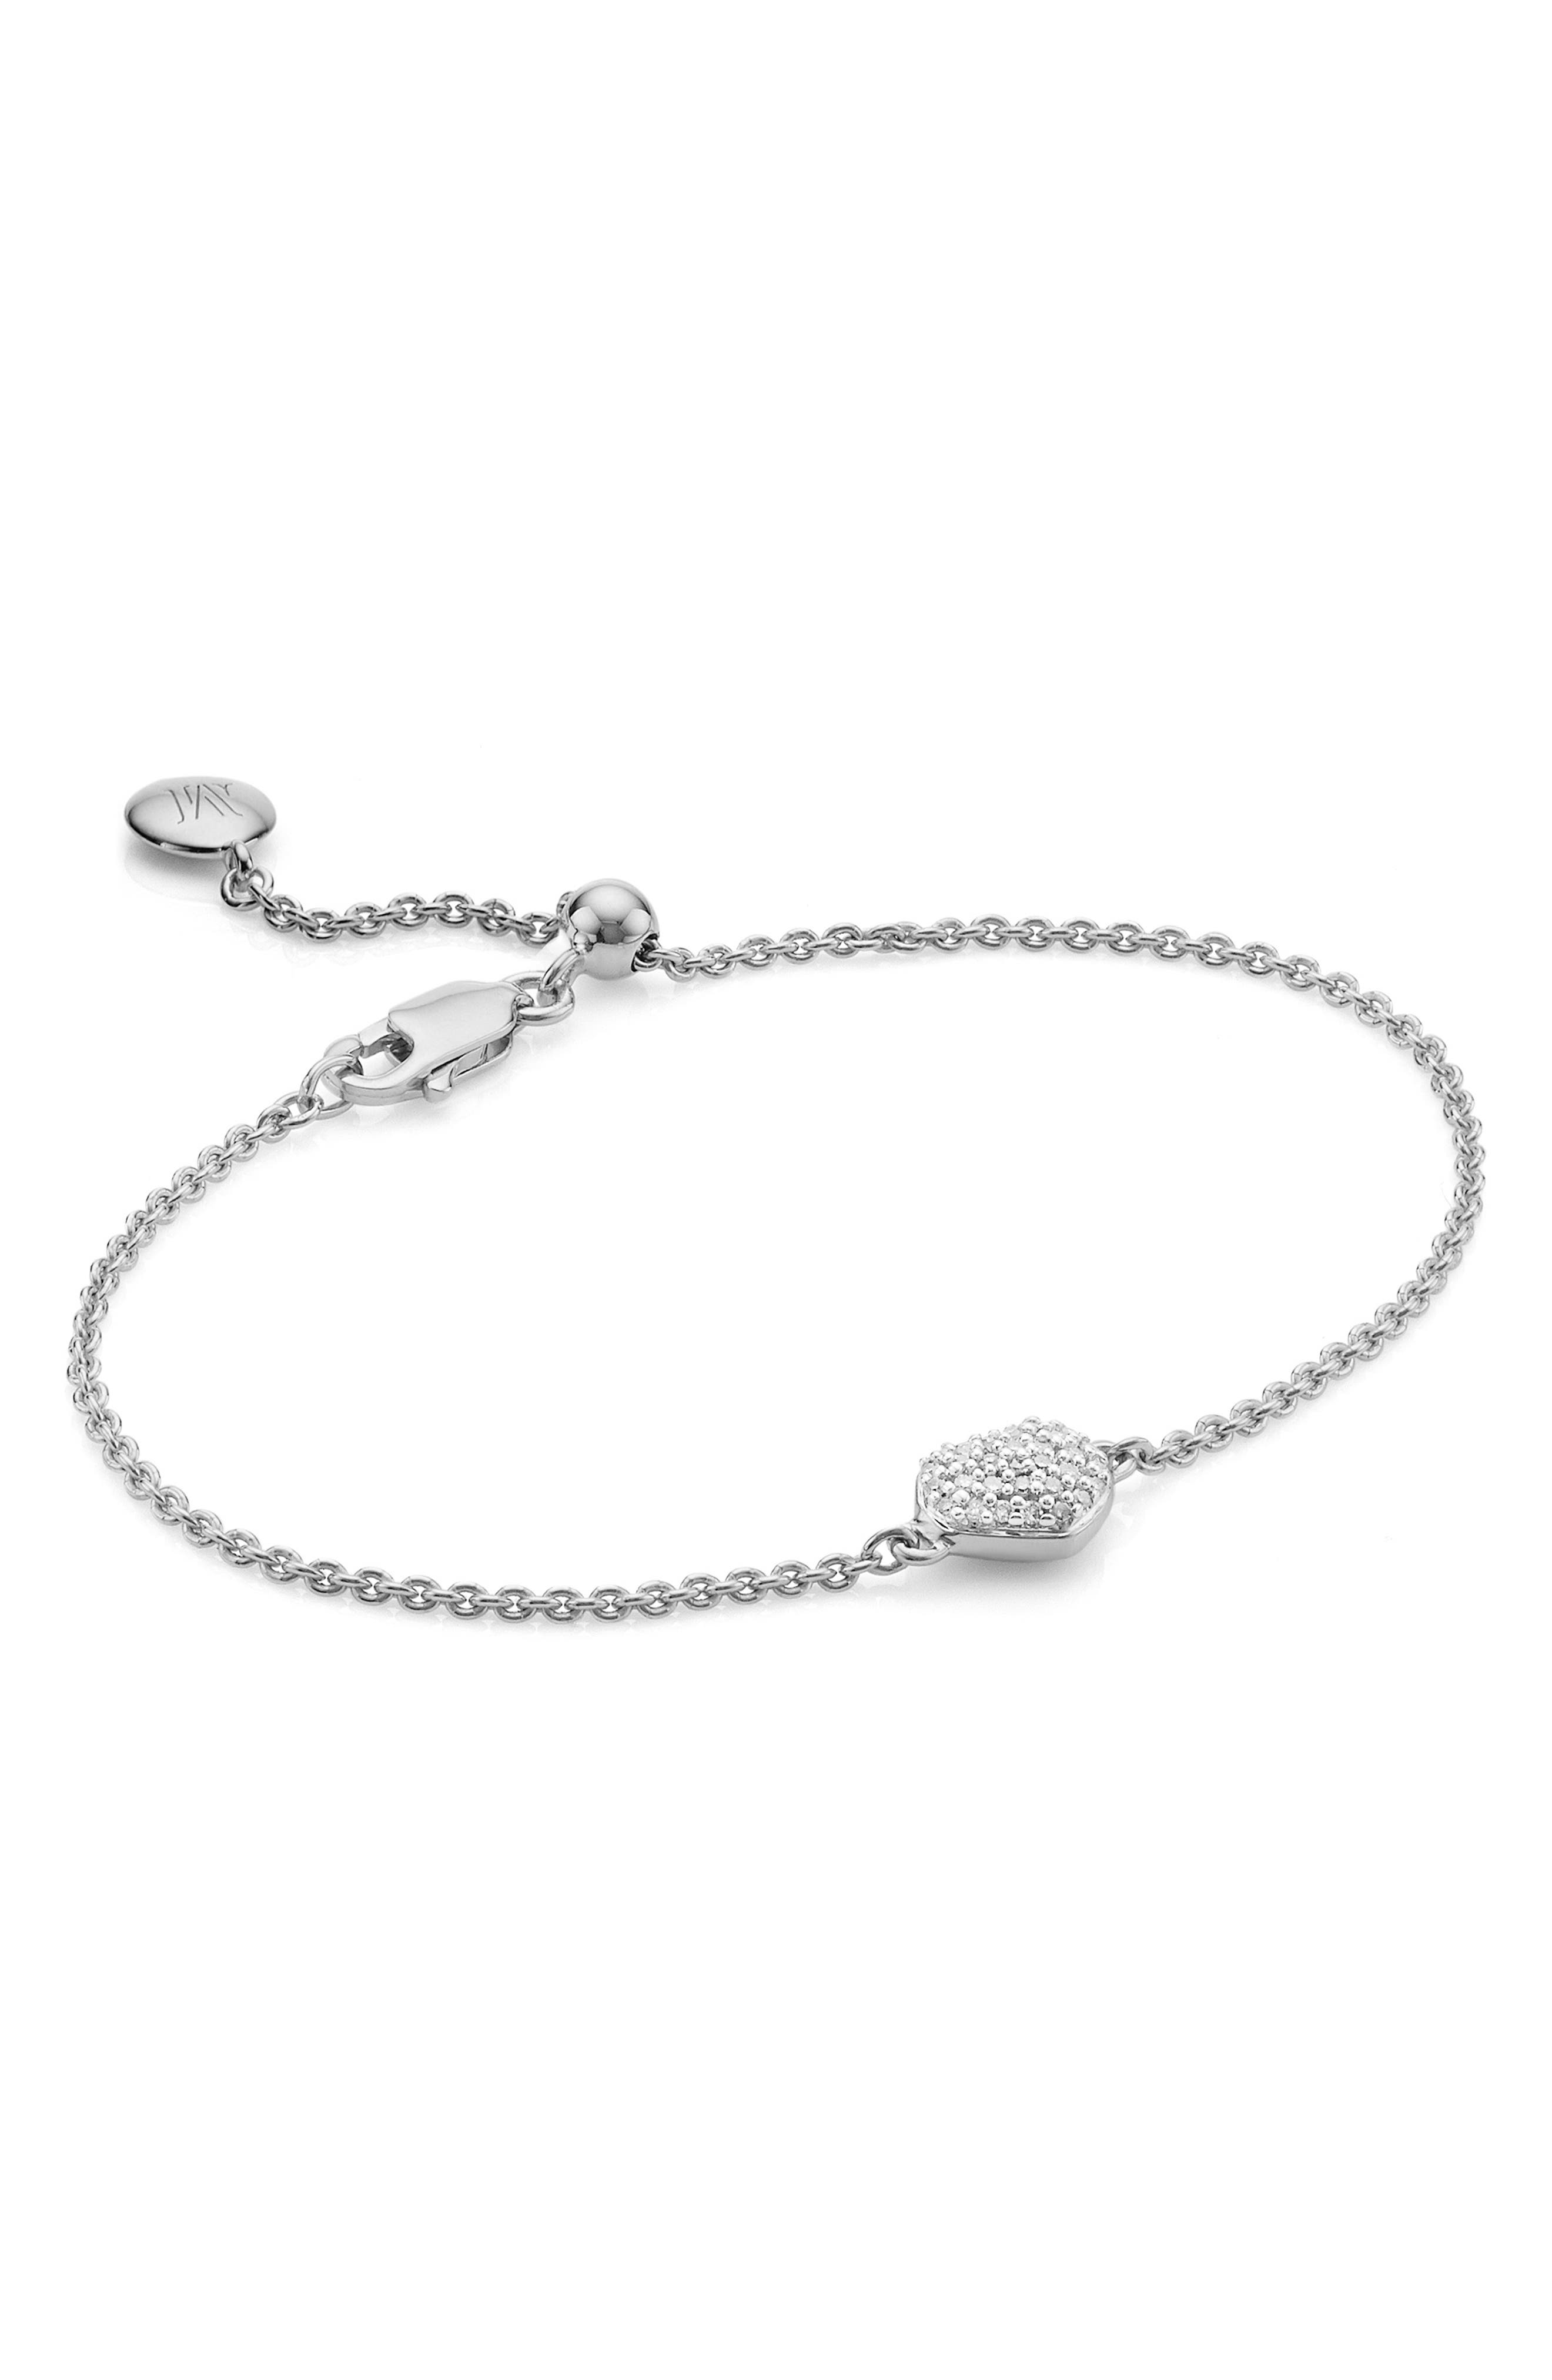 MONICA VINADER, Nura Mini Diamond Heart Bracelet, Main thumbnail 1, color, SILVER/ DIAMOND